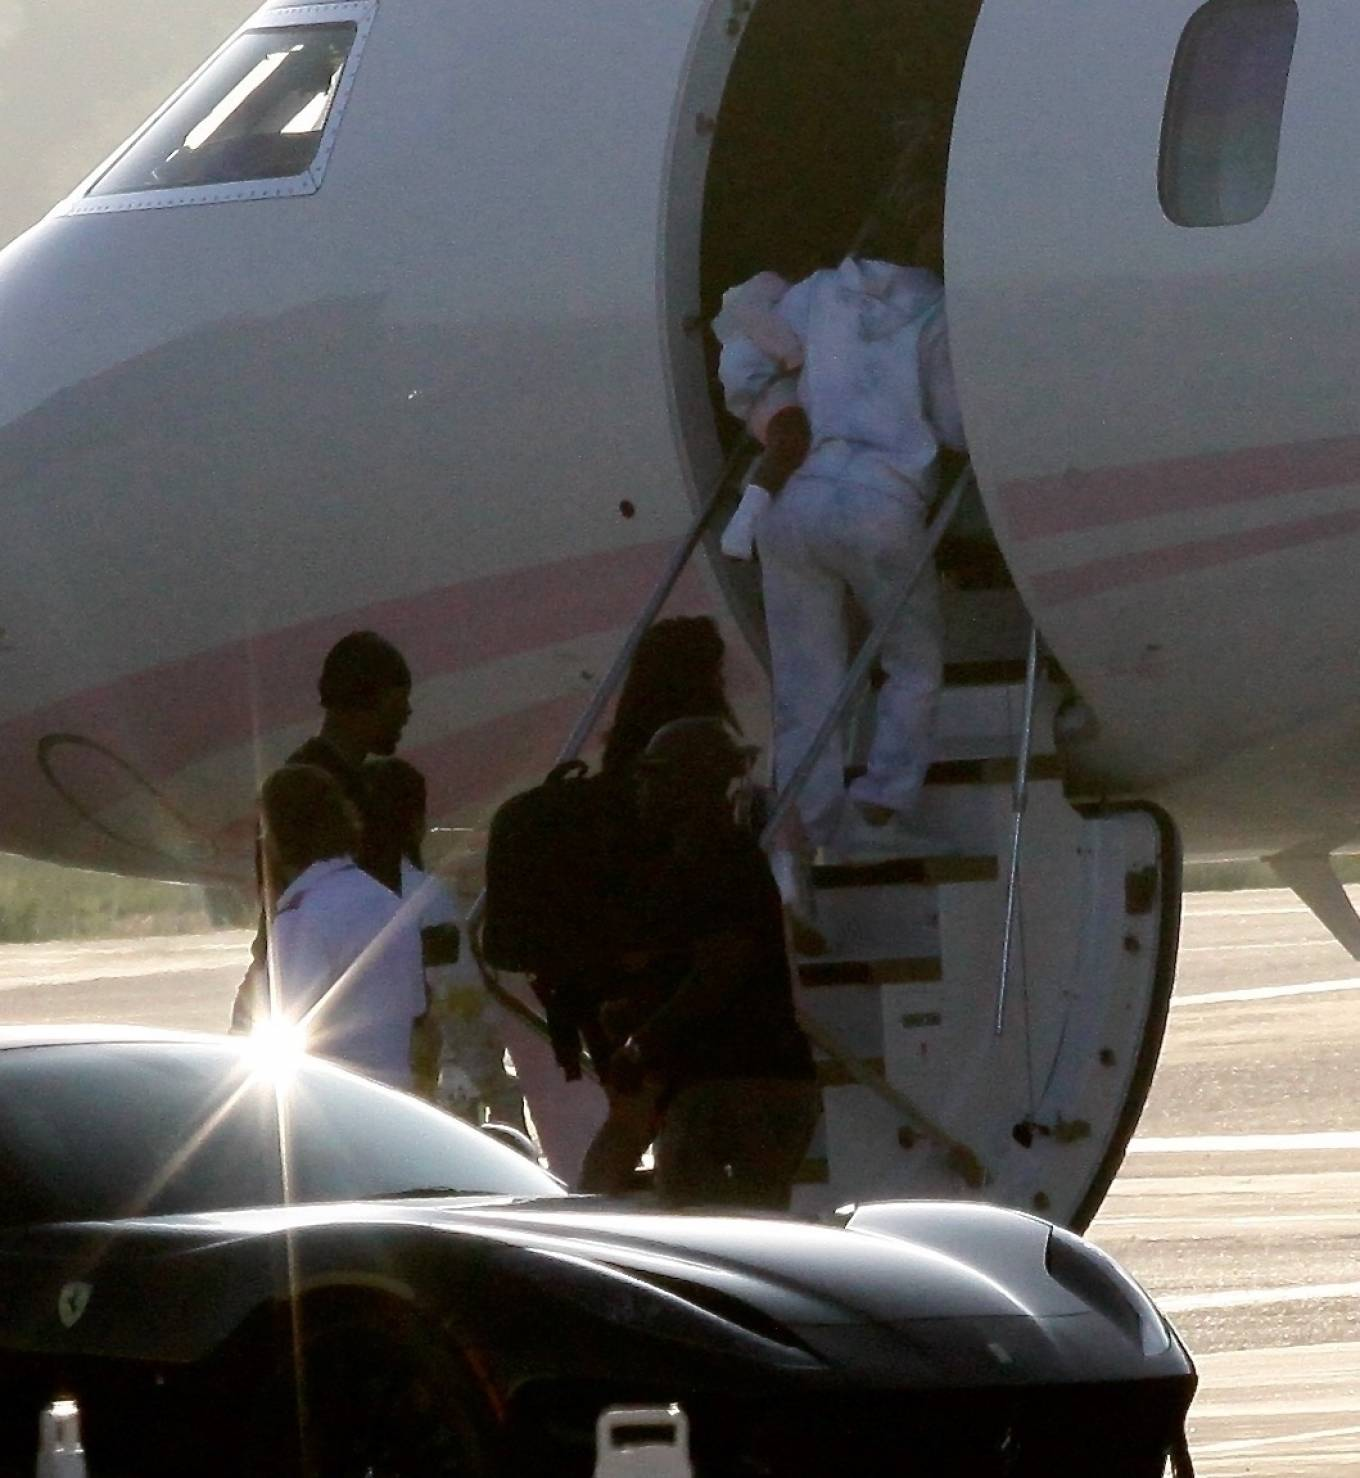 Khloe Kardashian 2020 : Khloe Kardashian and Kourtney Kardashian – Pictured boarding Kylie Jenners private jet in Van Nuys-10